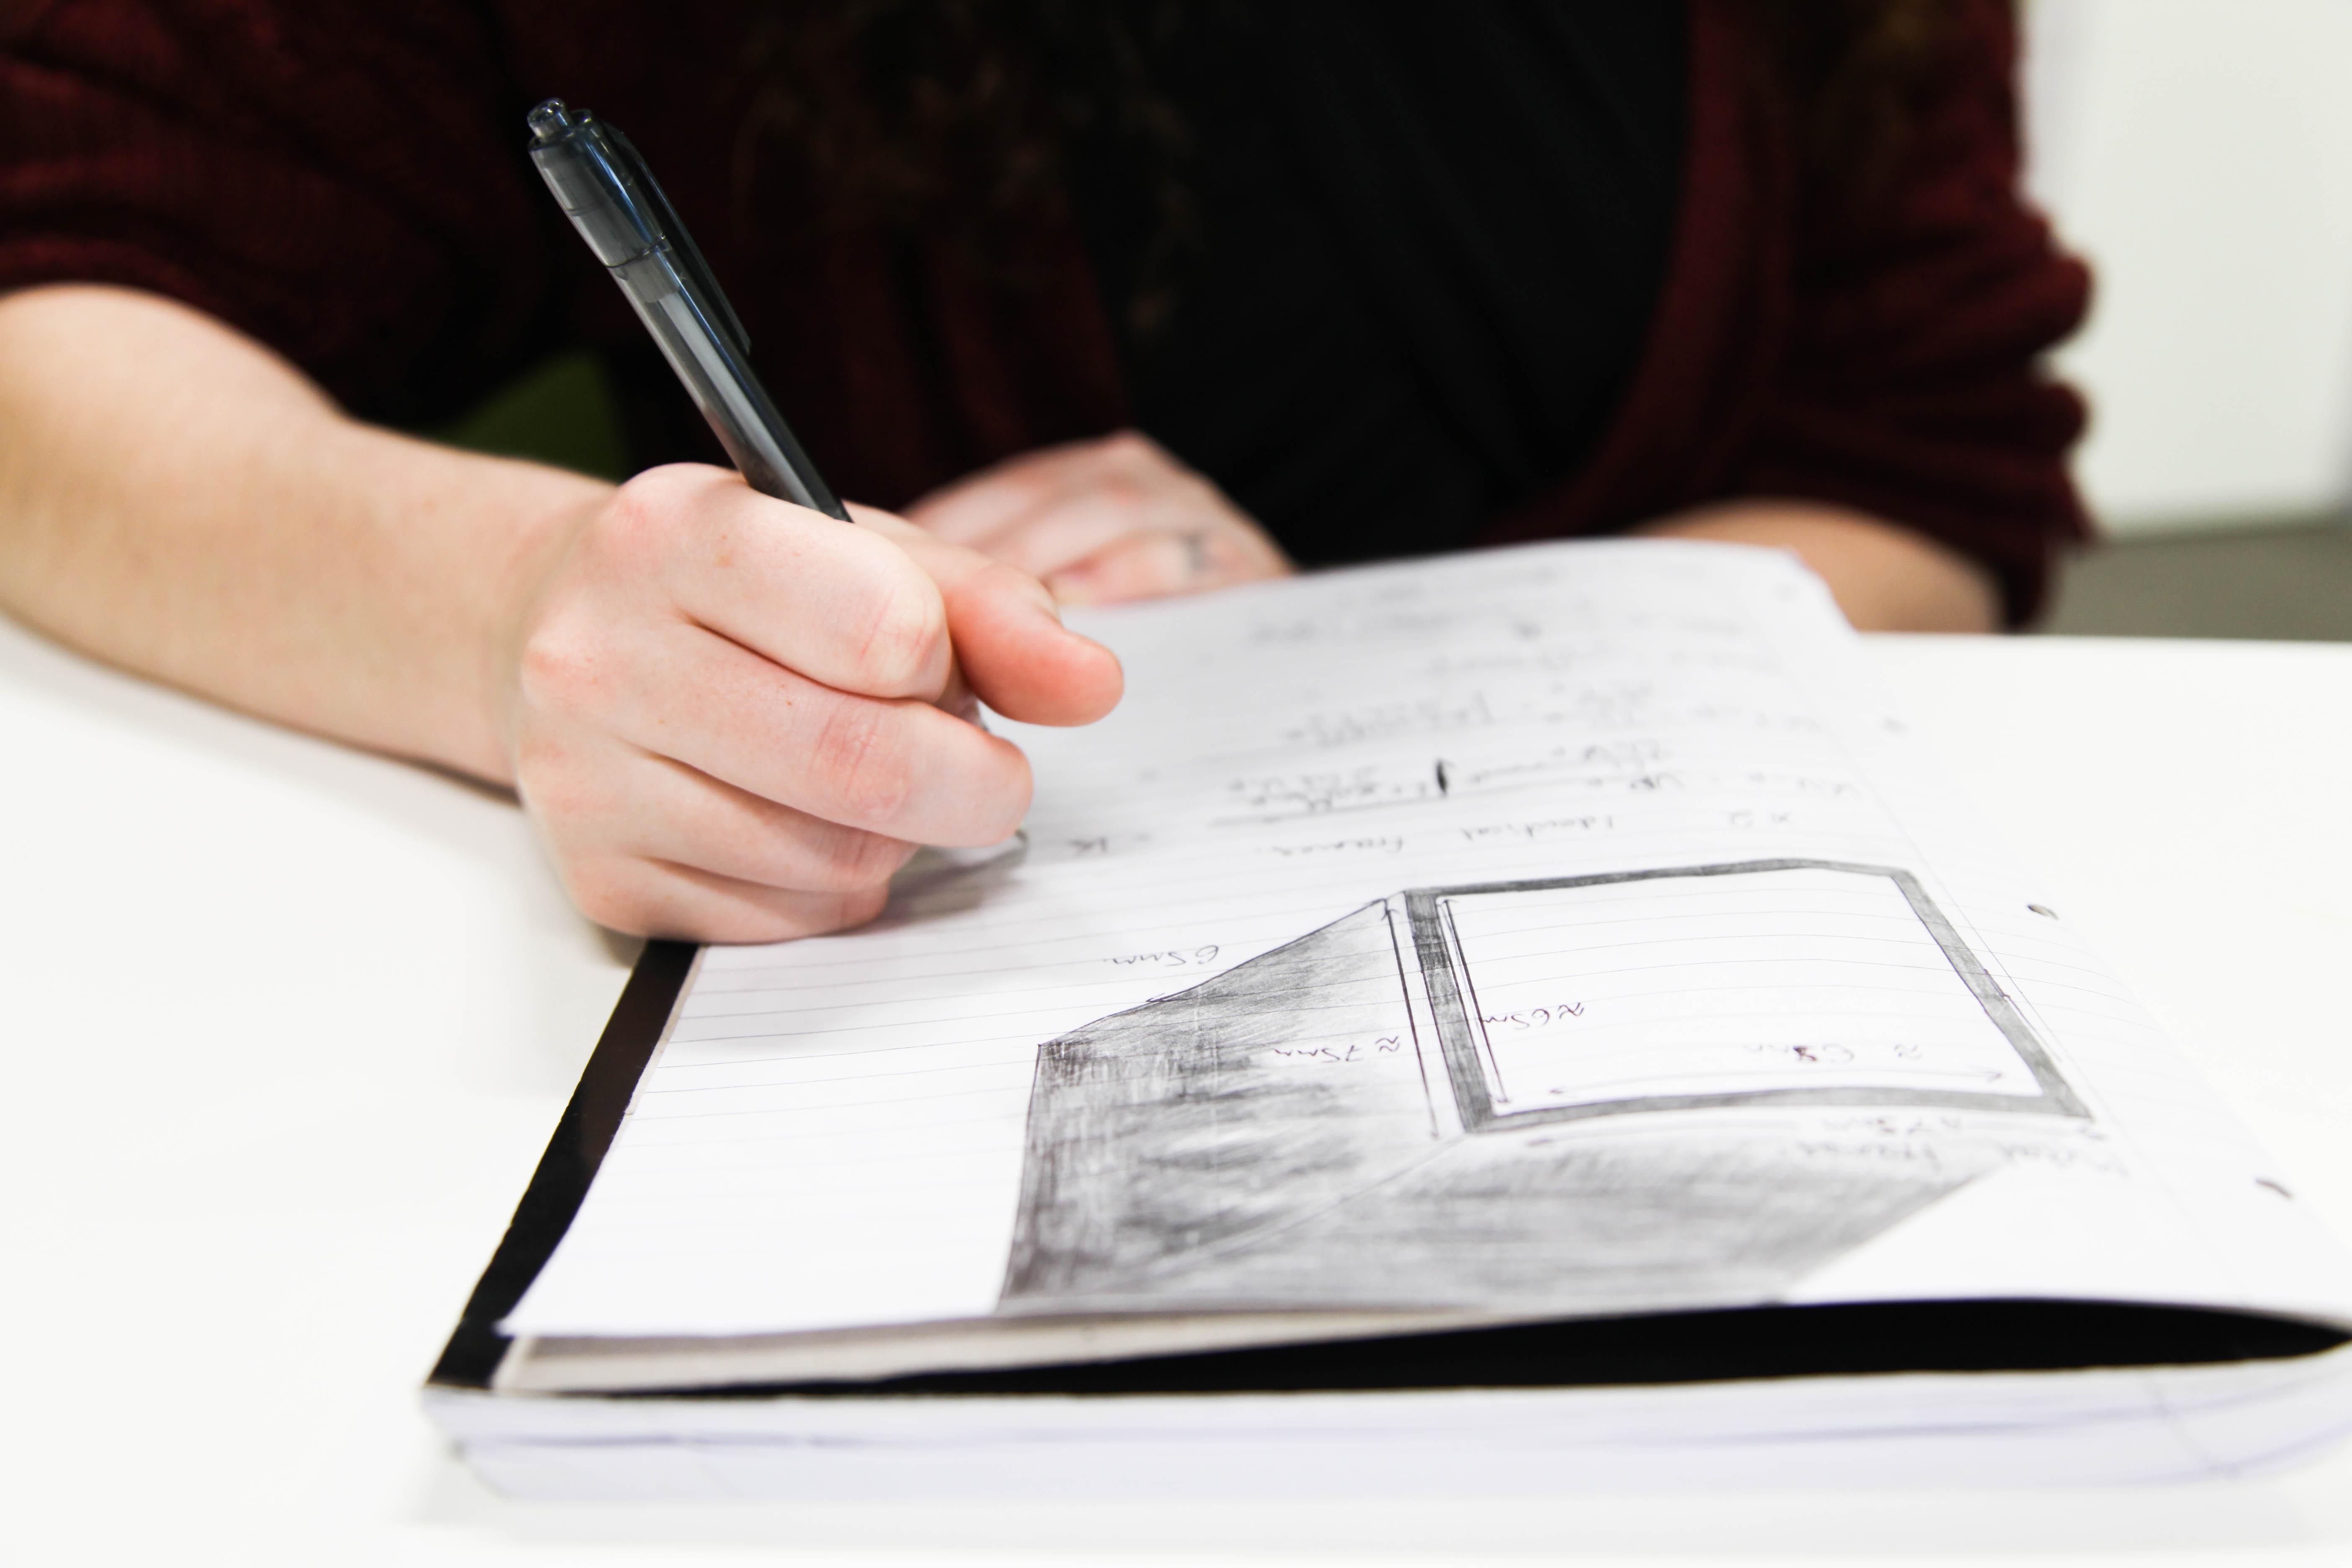 Image - Student writing